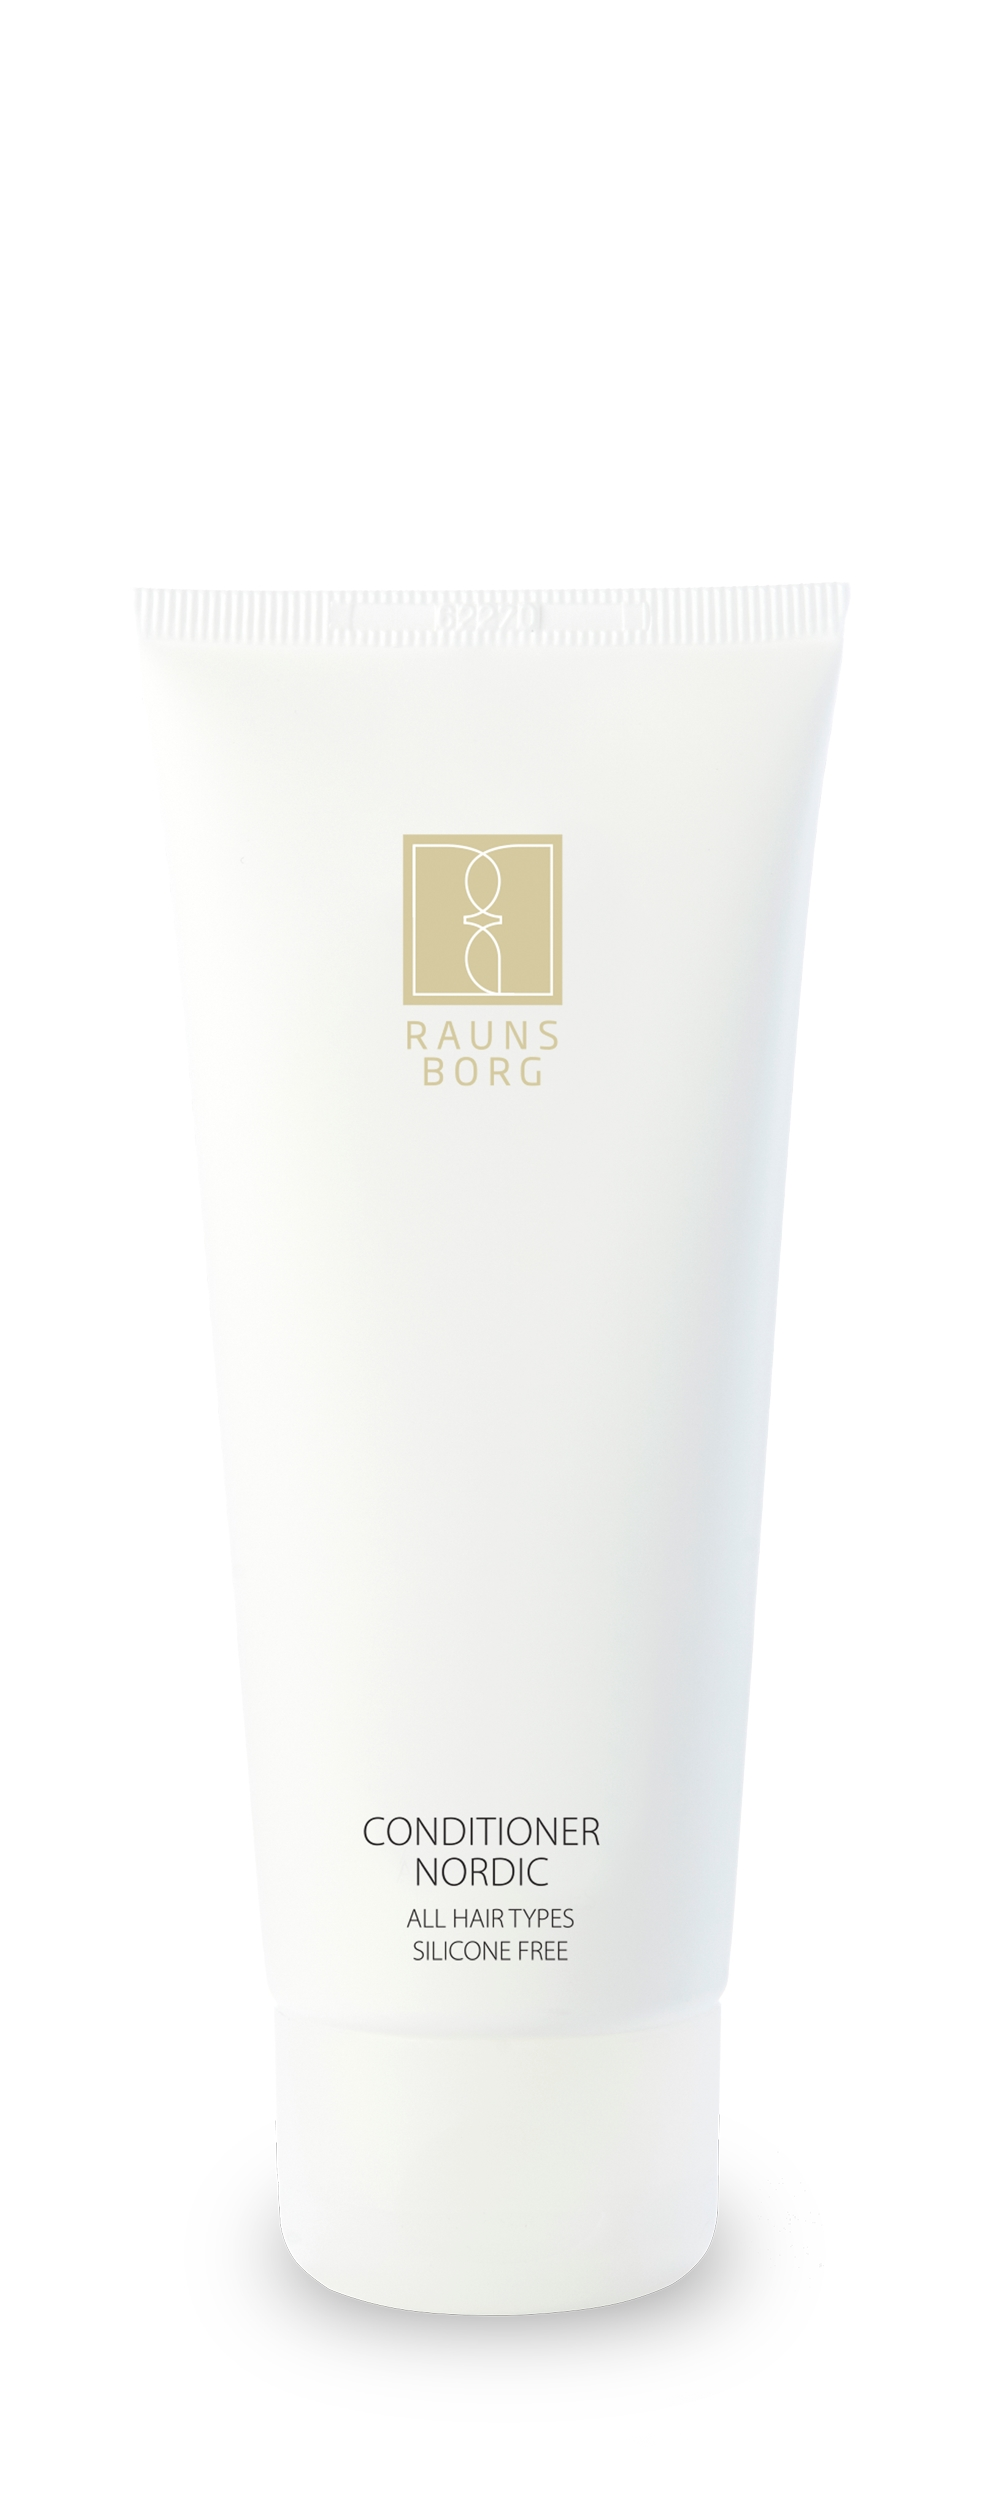 Raunsborg Nordic Conditioner Travel Size, 75 ml